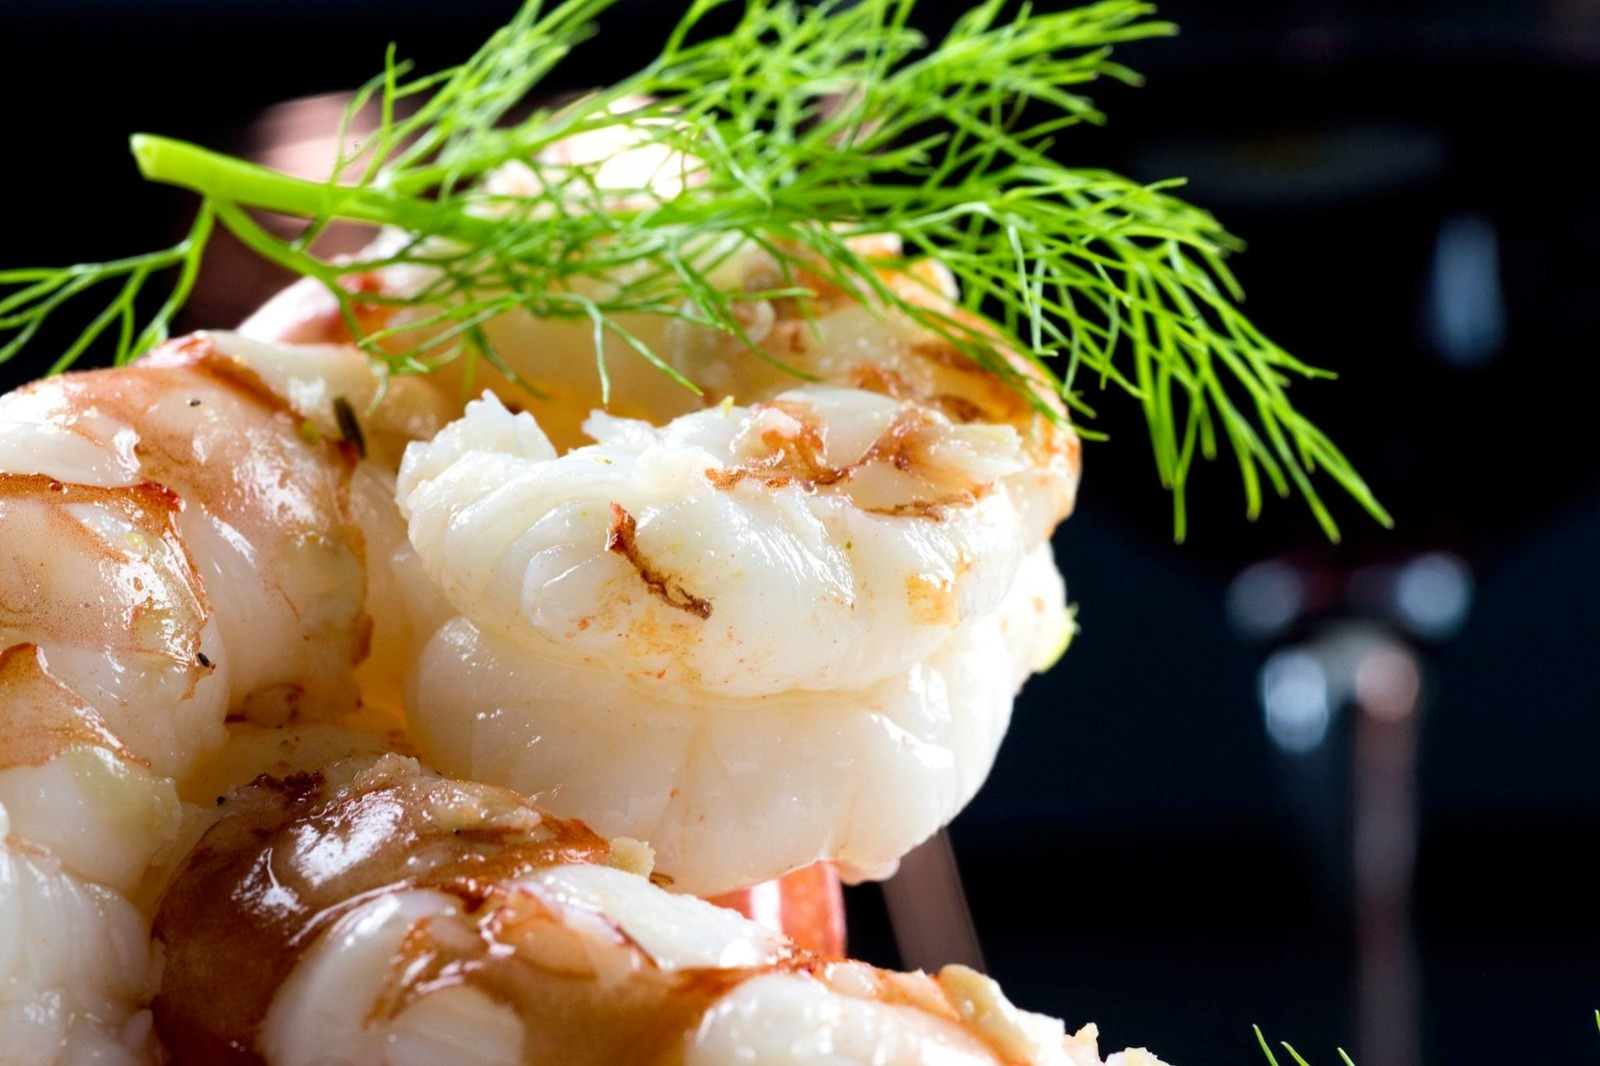 foodphotography-1608284856.jpg